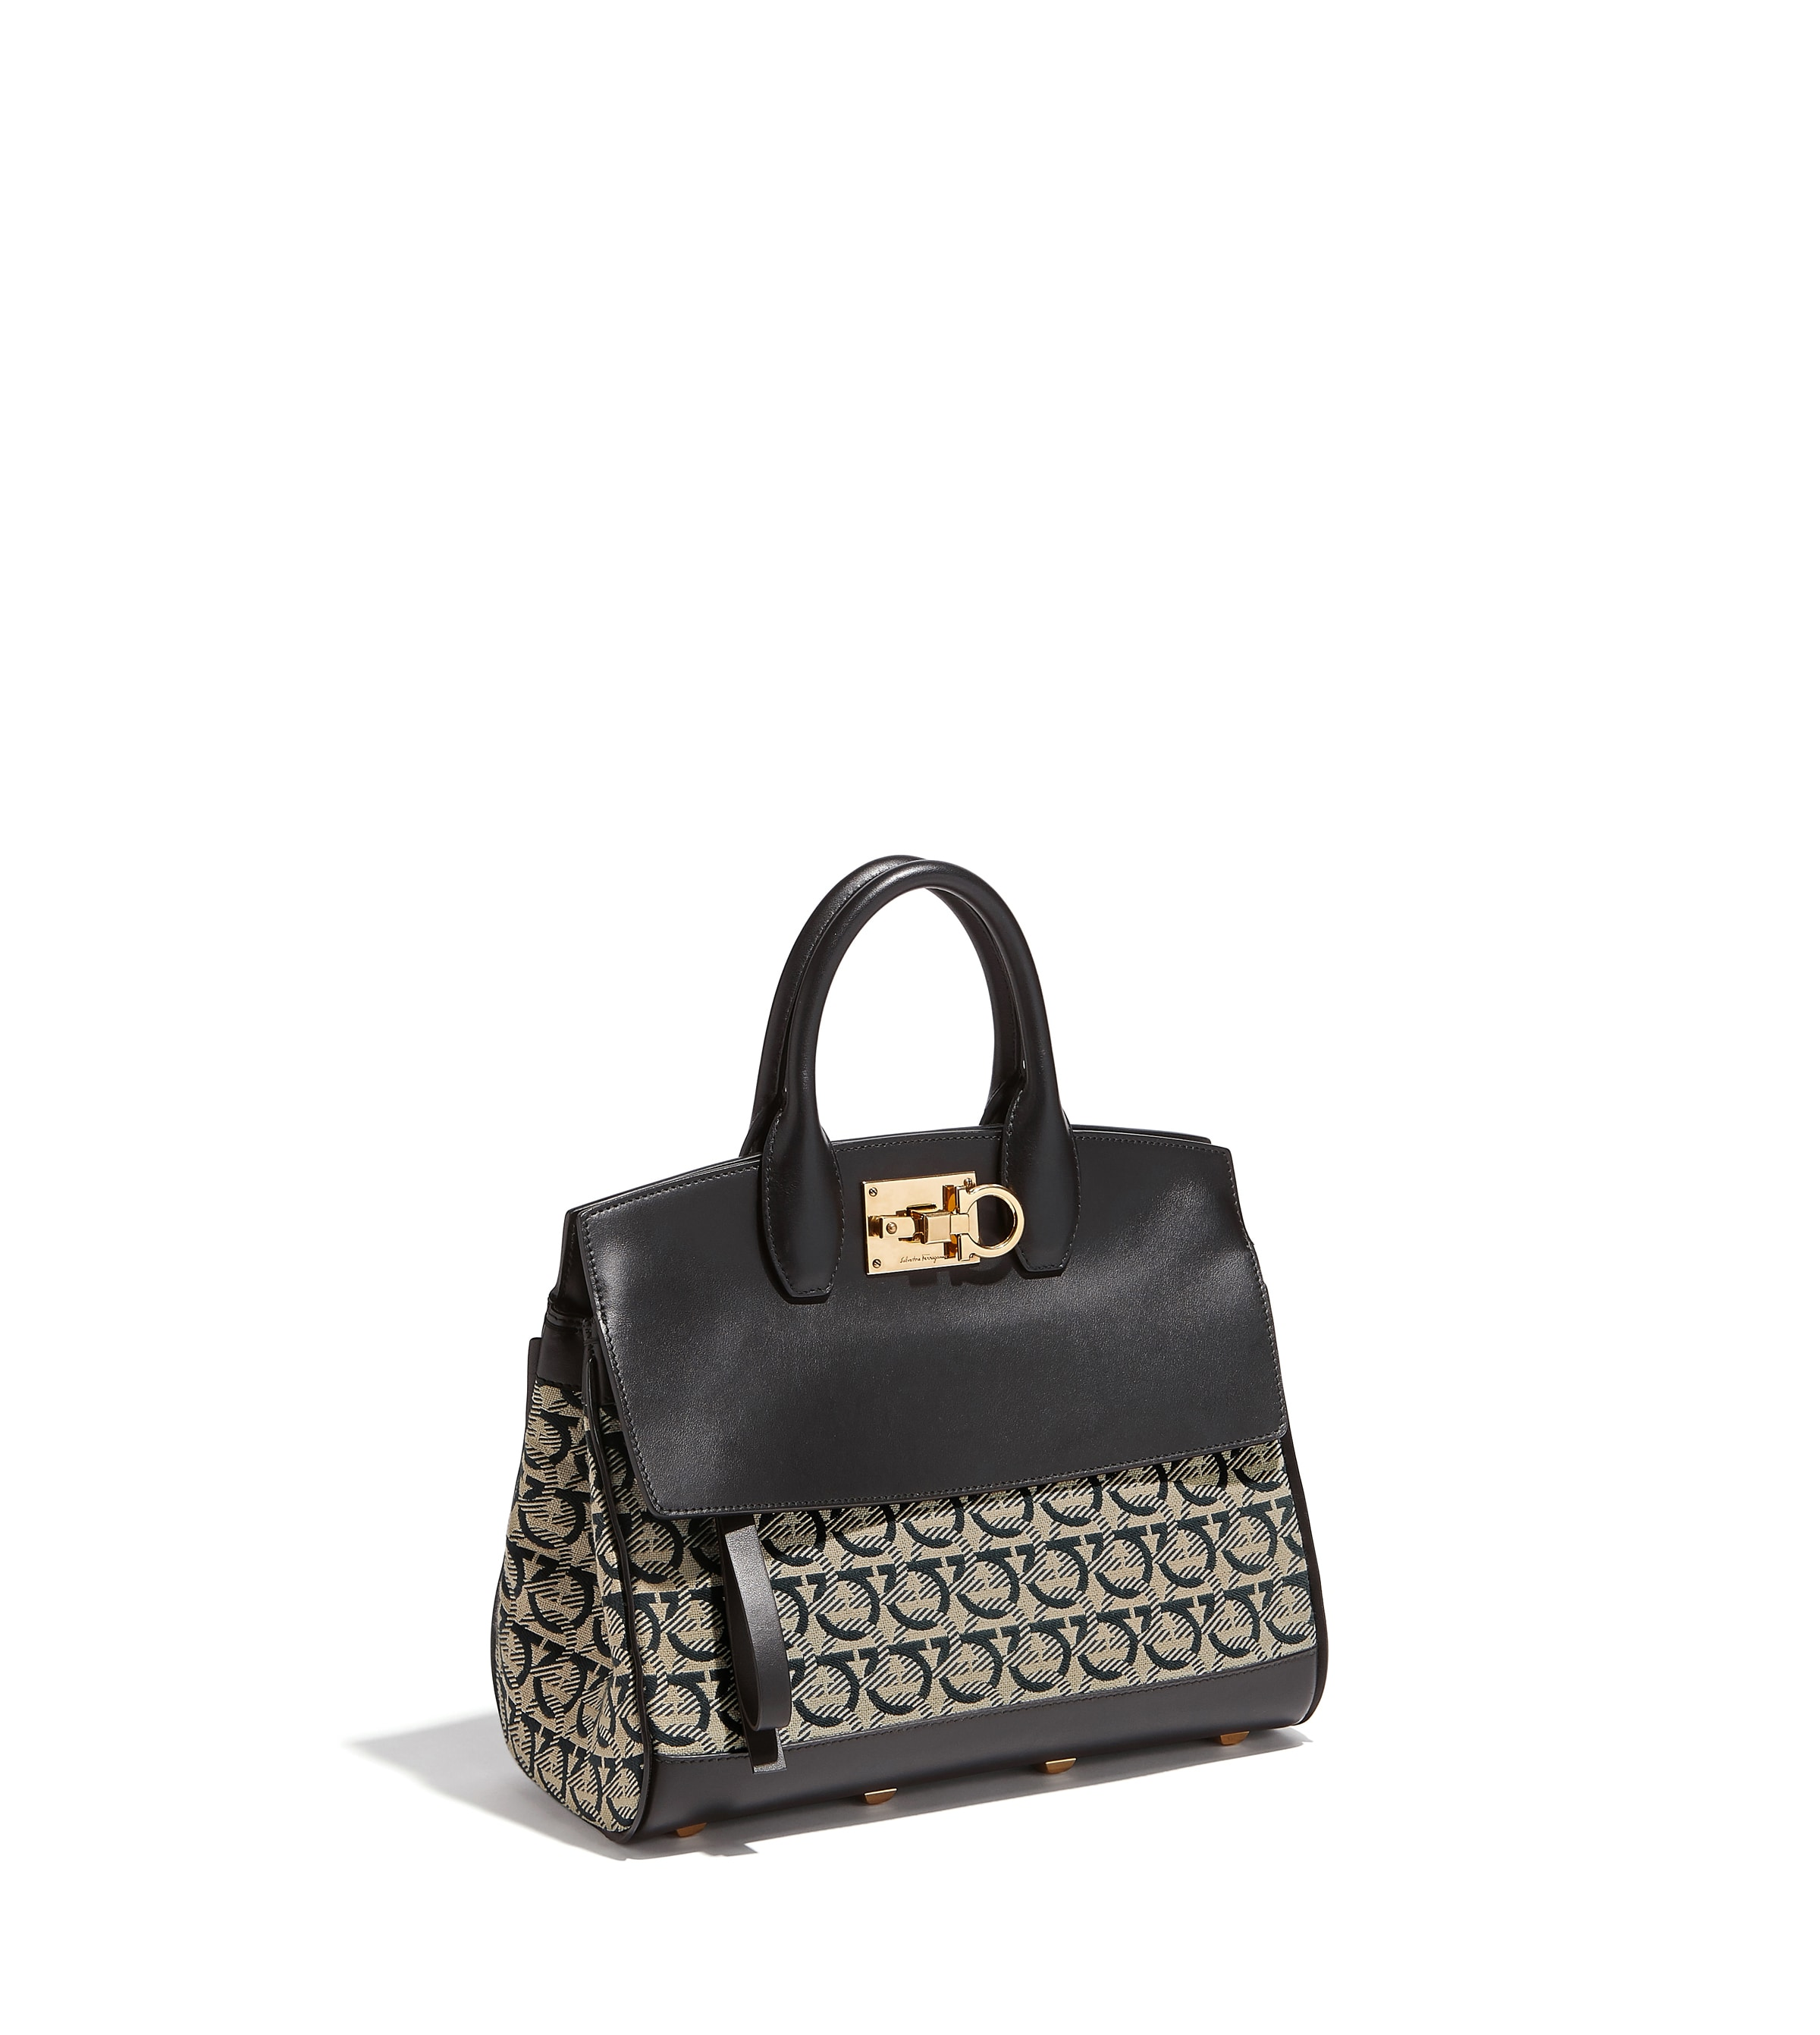 Ferragamo Studio bag - Top handles - Handbags - Women - Salvatore Ferragamo EU